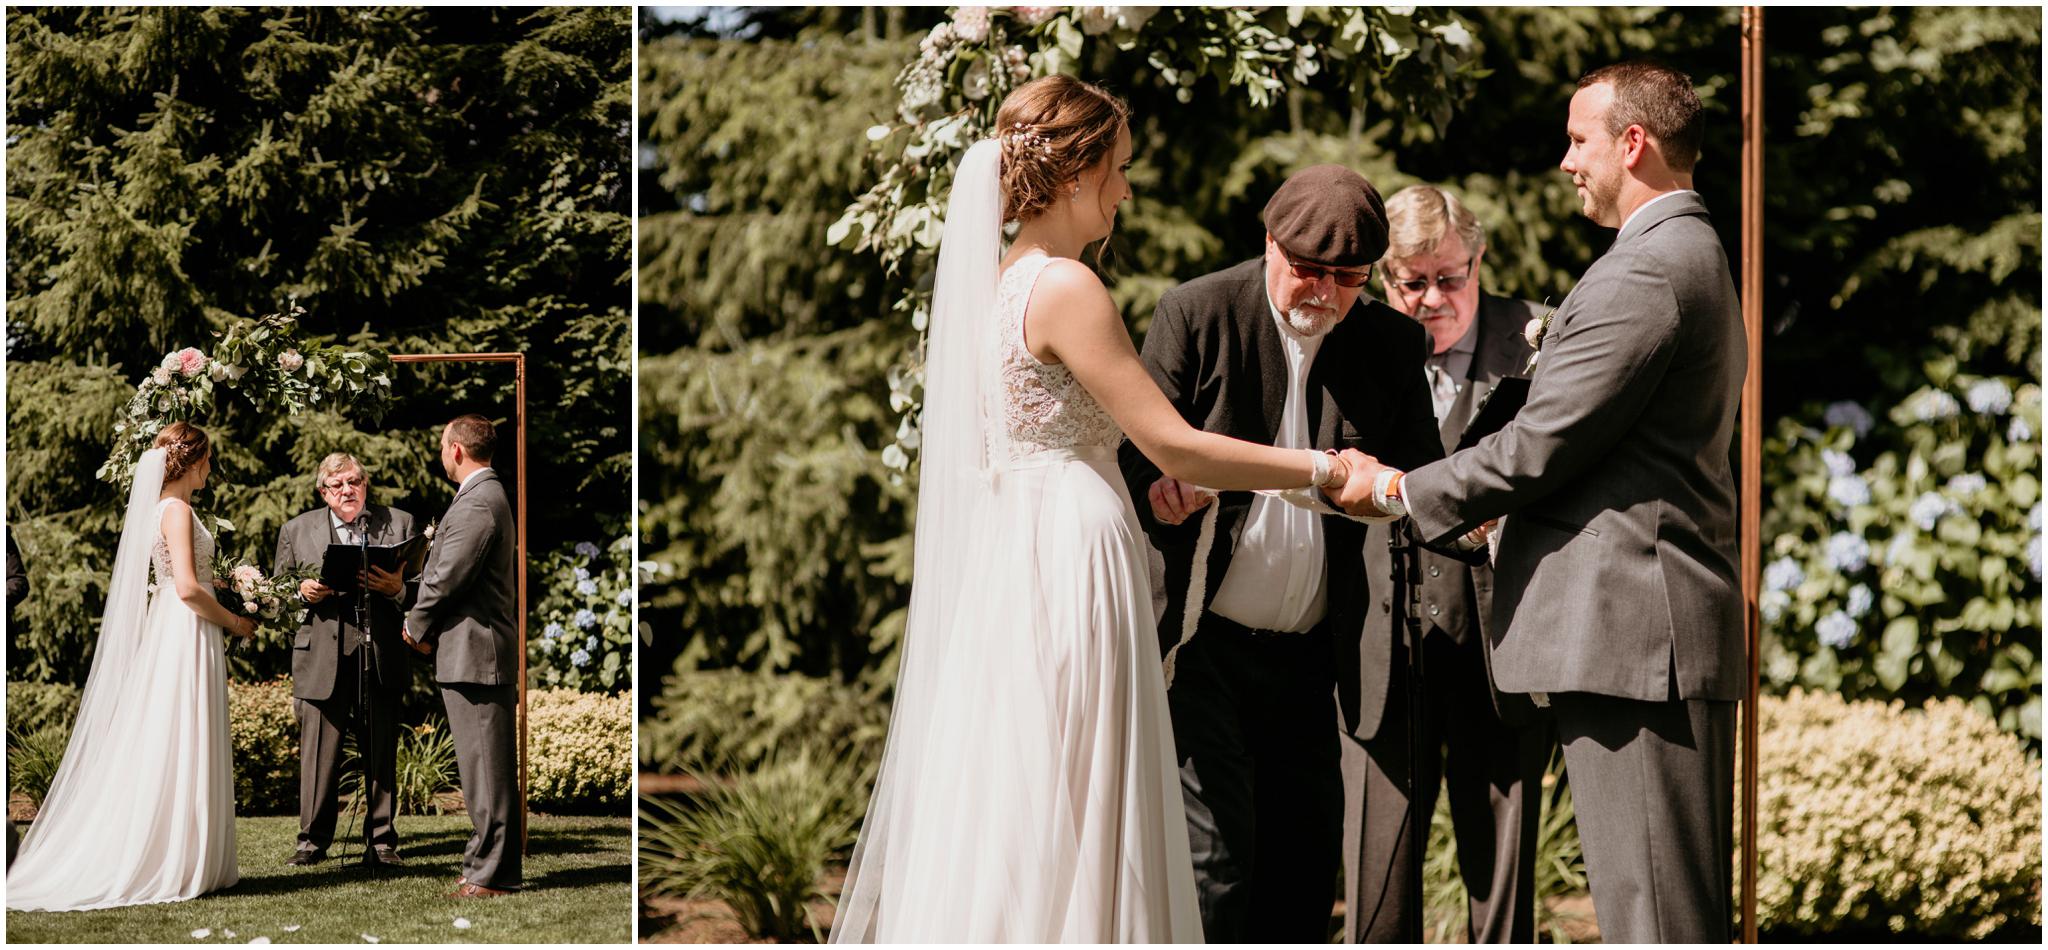 erin-and-tyler-evergreen-gardens-bellingham-wedding-photographer-064.jpg